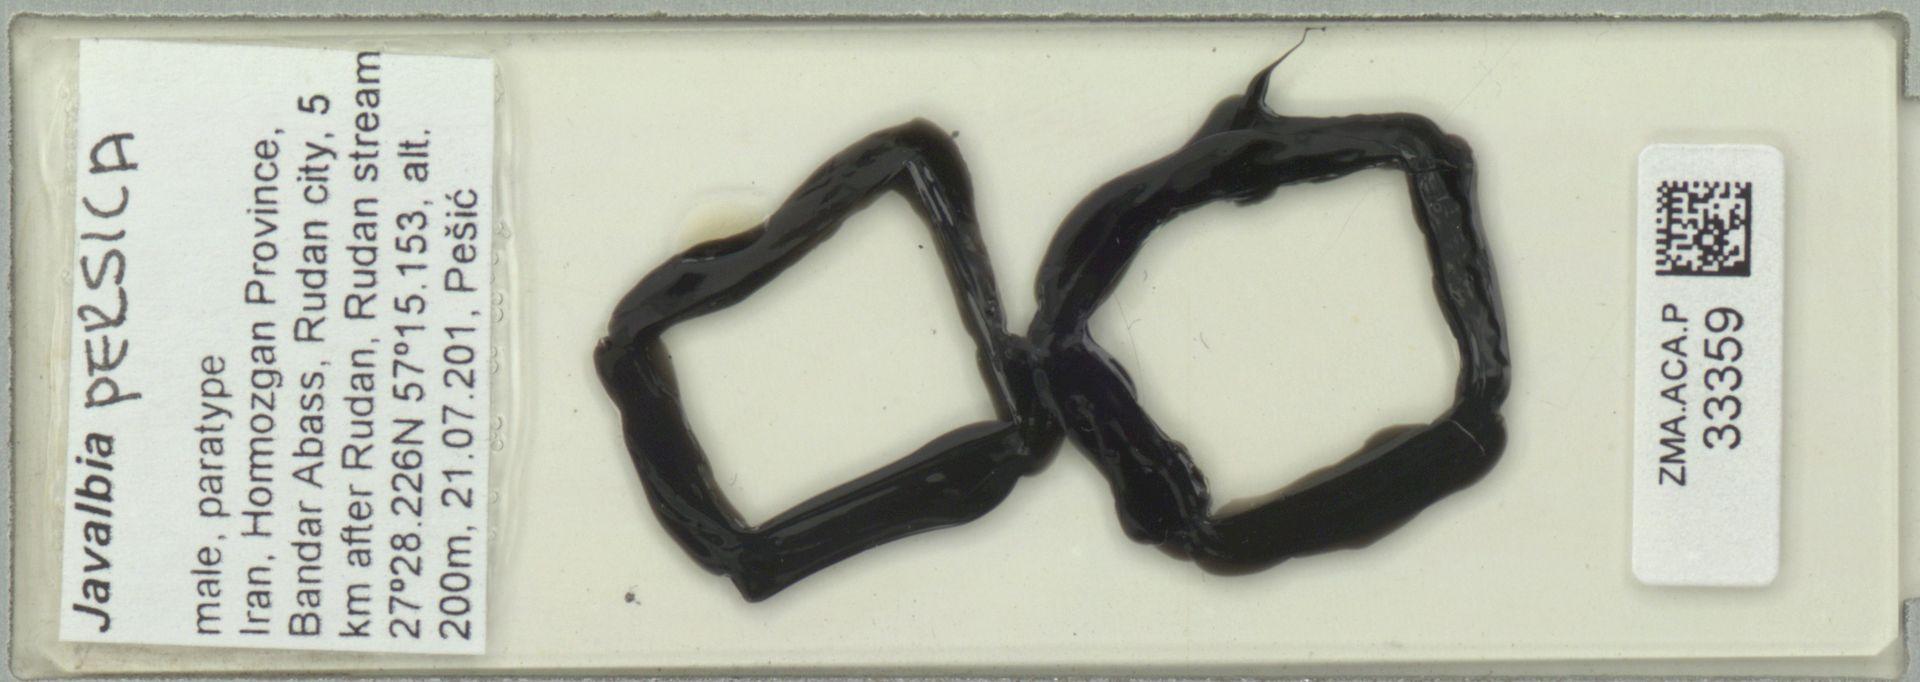 ZMA.ACA.P.33359 | Javalbia persica Pesic, Smit & Saboori, 2012